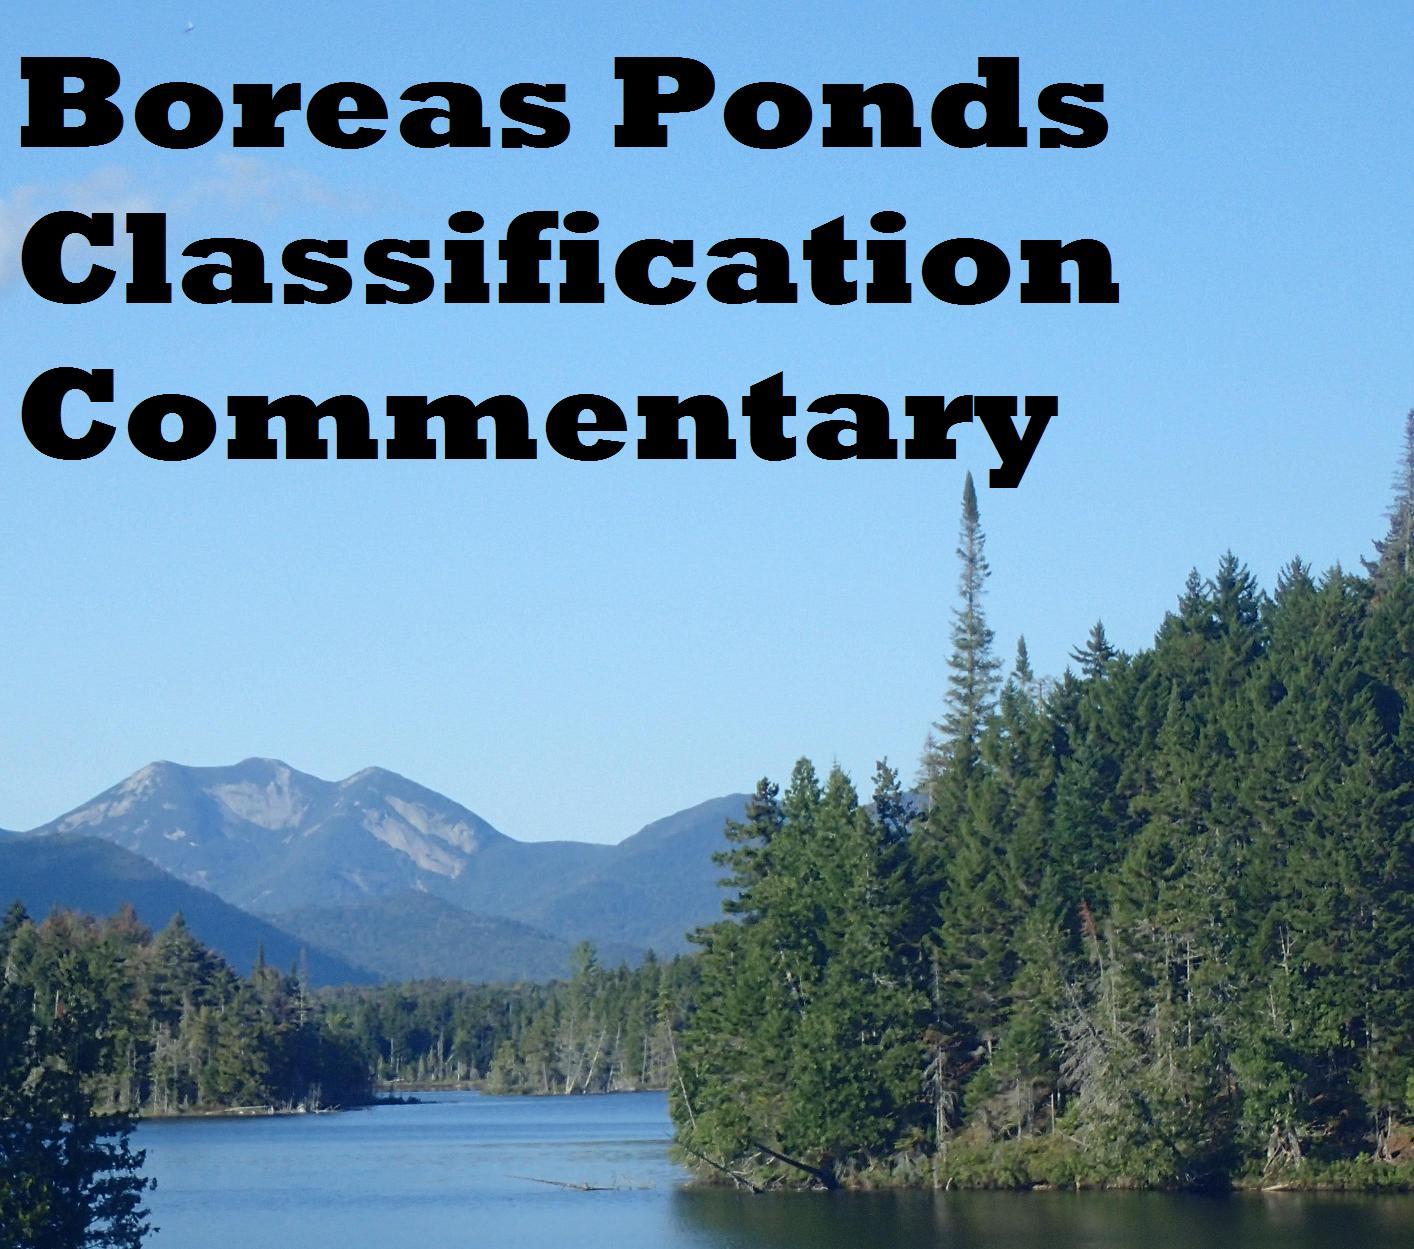 Boreas Ponds Classification